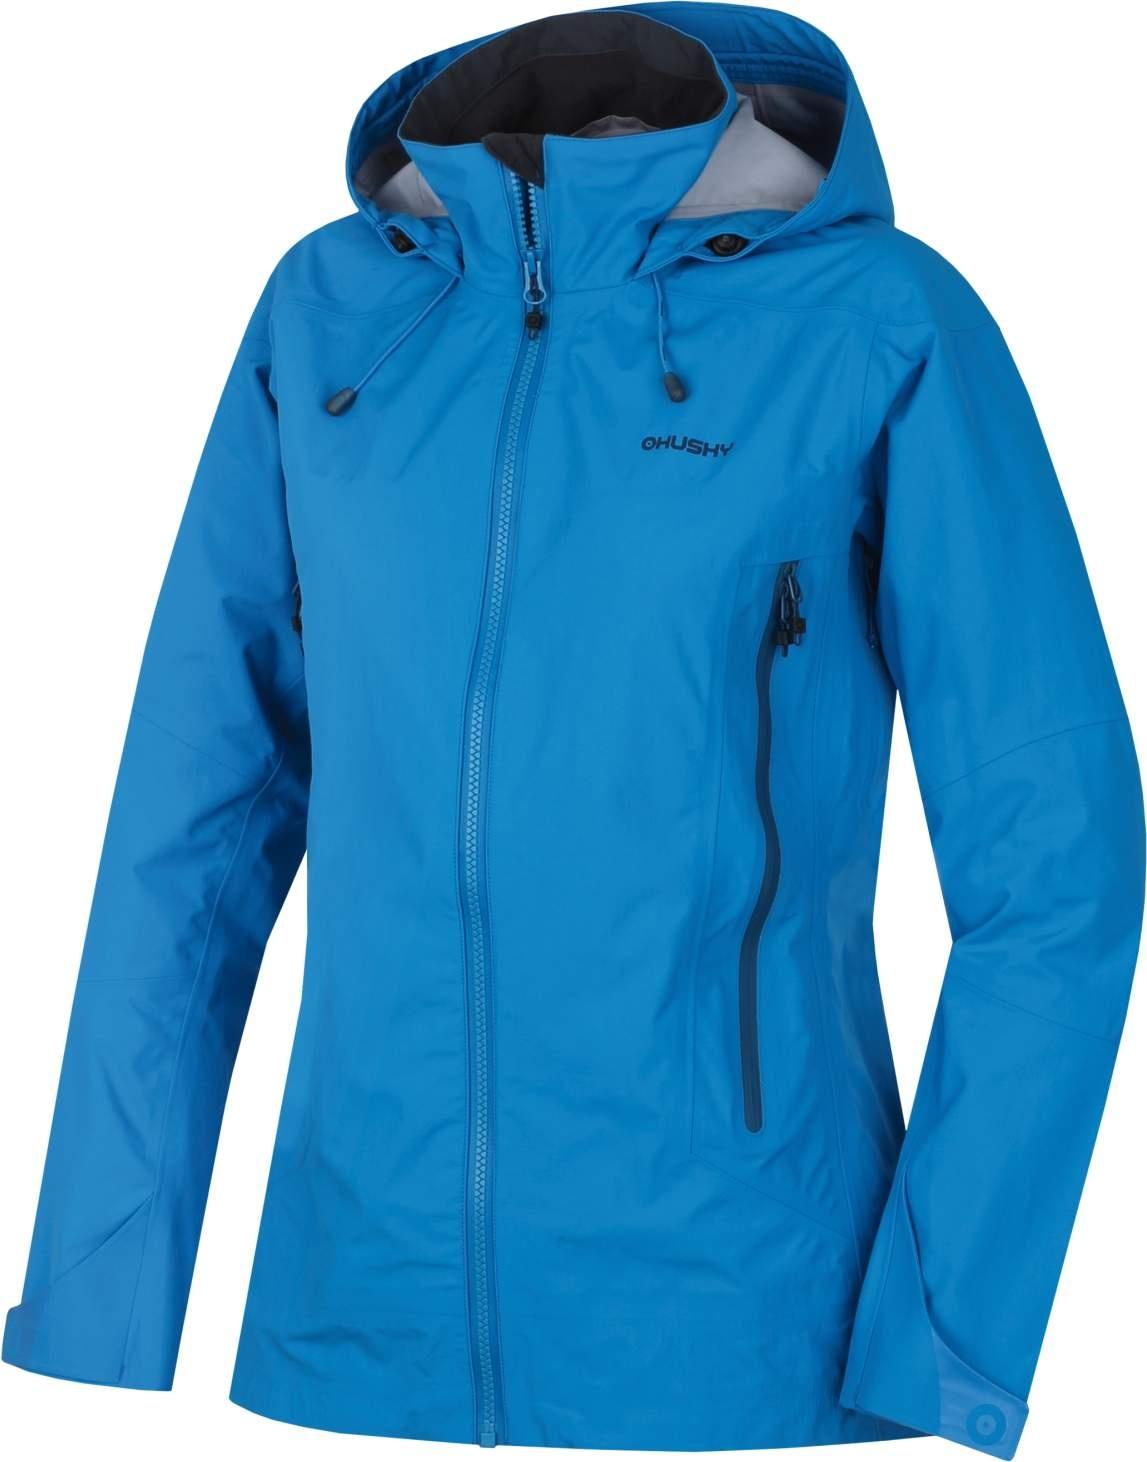 Husky Dámská outdoor bunda Nakron L modrá Velikost: M